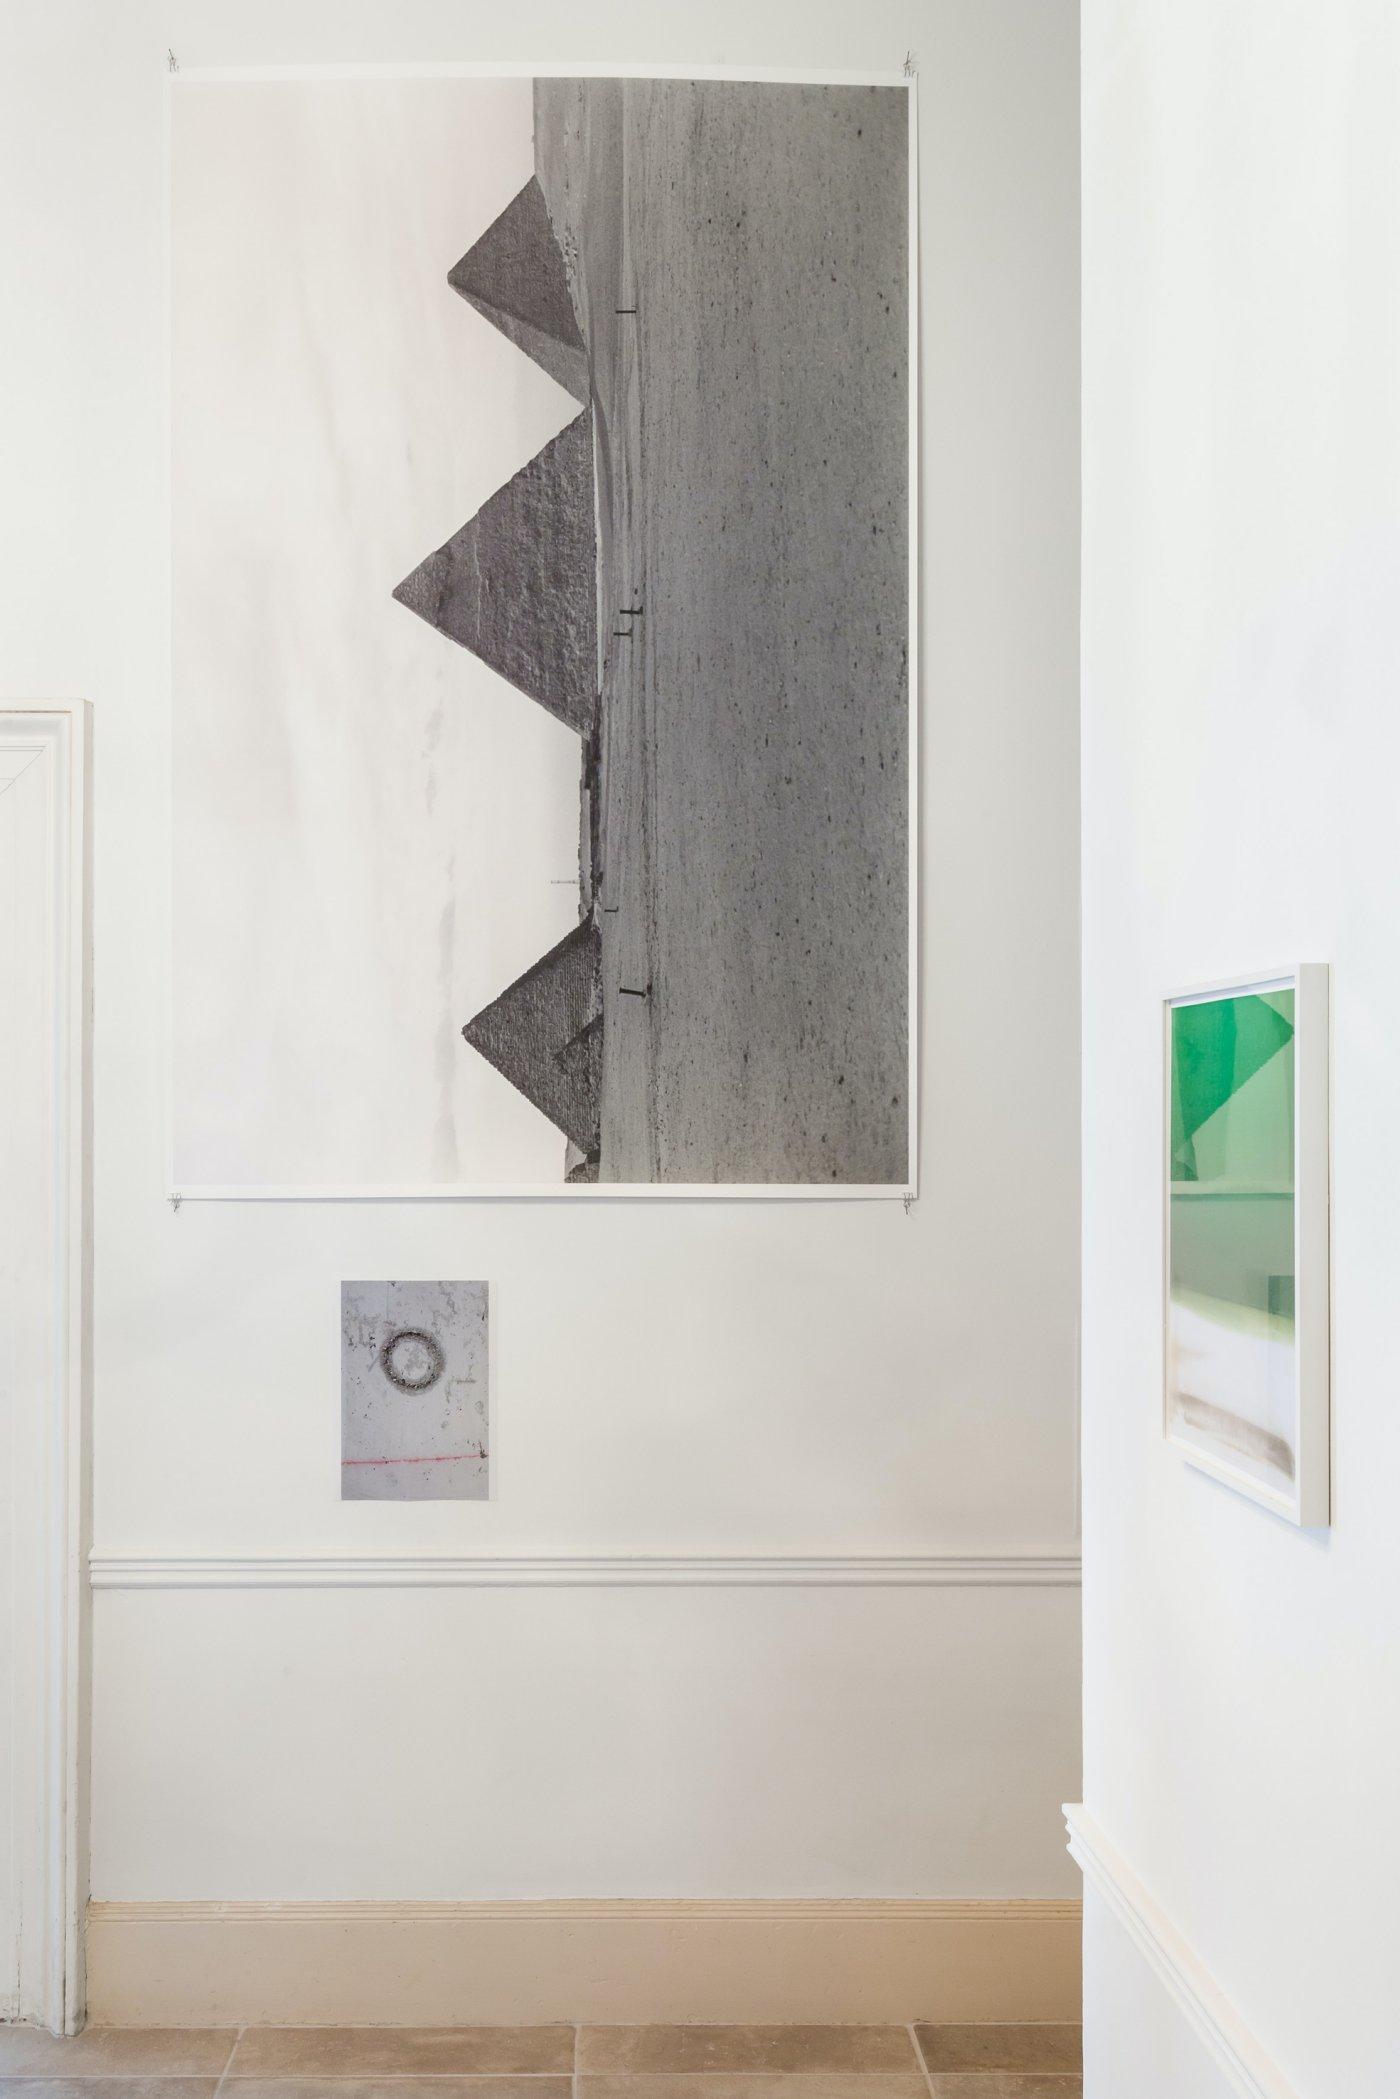 Maureen Paley Morena di Luna Wolfgang Tillmans 10